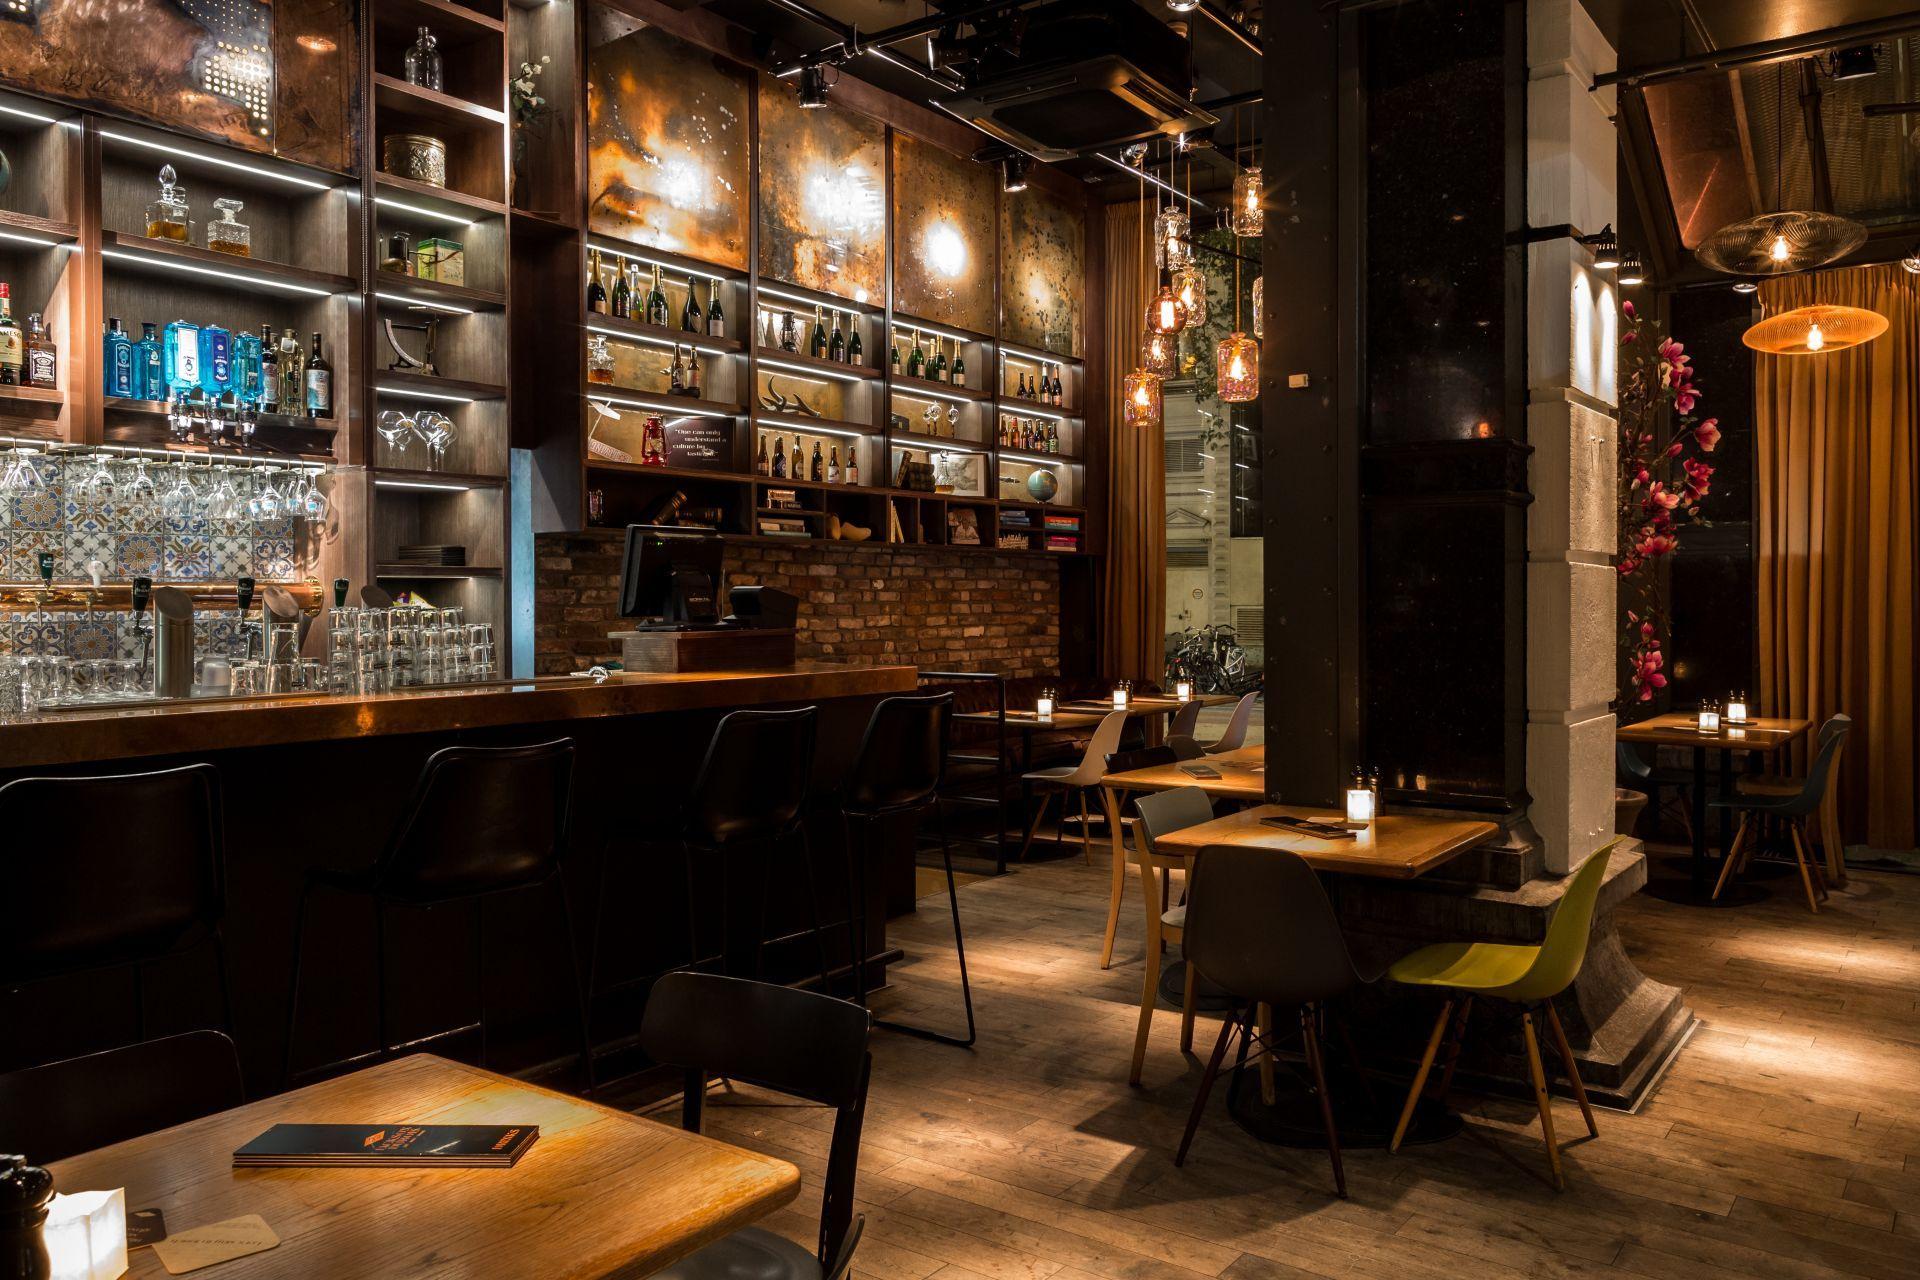 ENZO architectuur & interieur ® Switch van Caffe Esprit naar Jackson Dubois